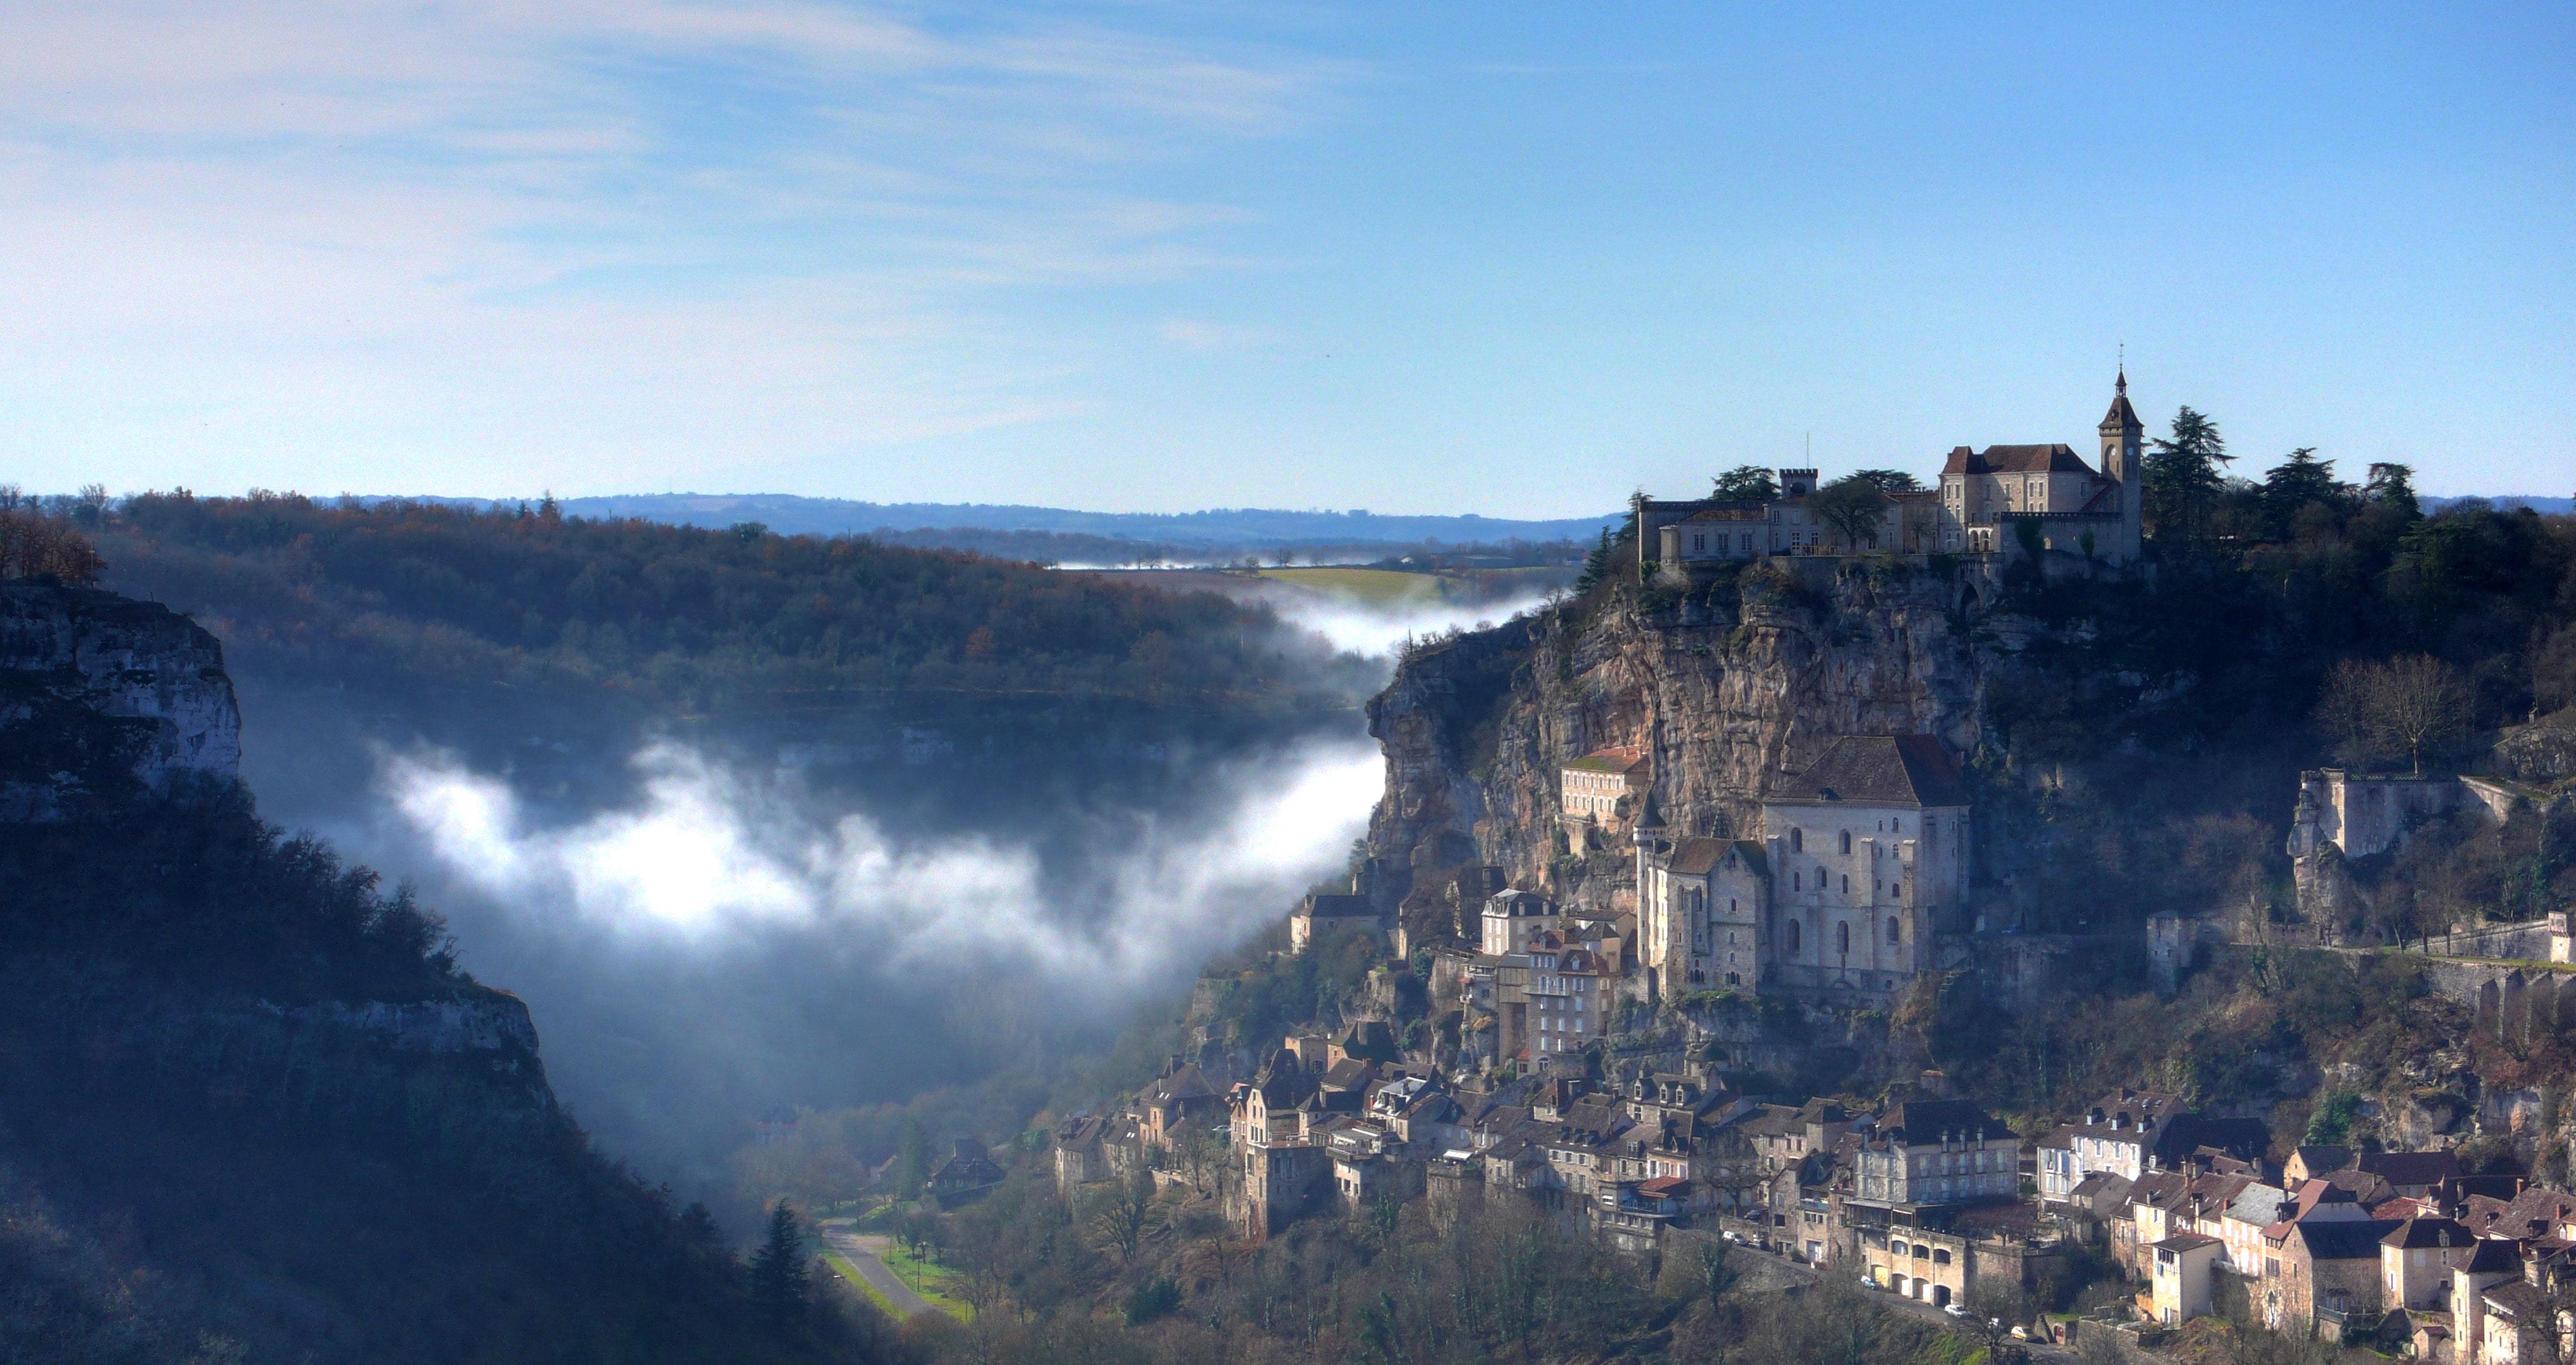 rocamadour-is-a-small-village-built-on-a-s-secret-world